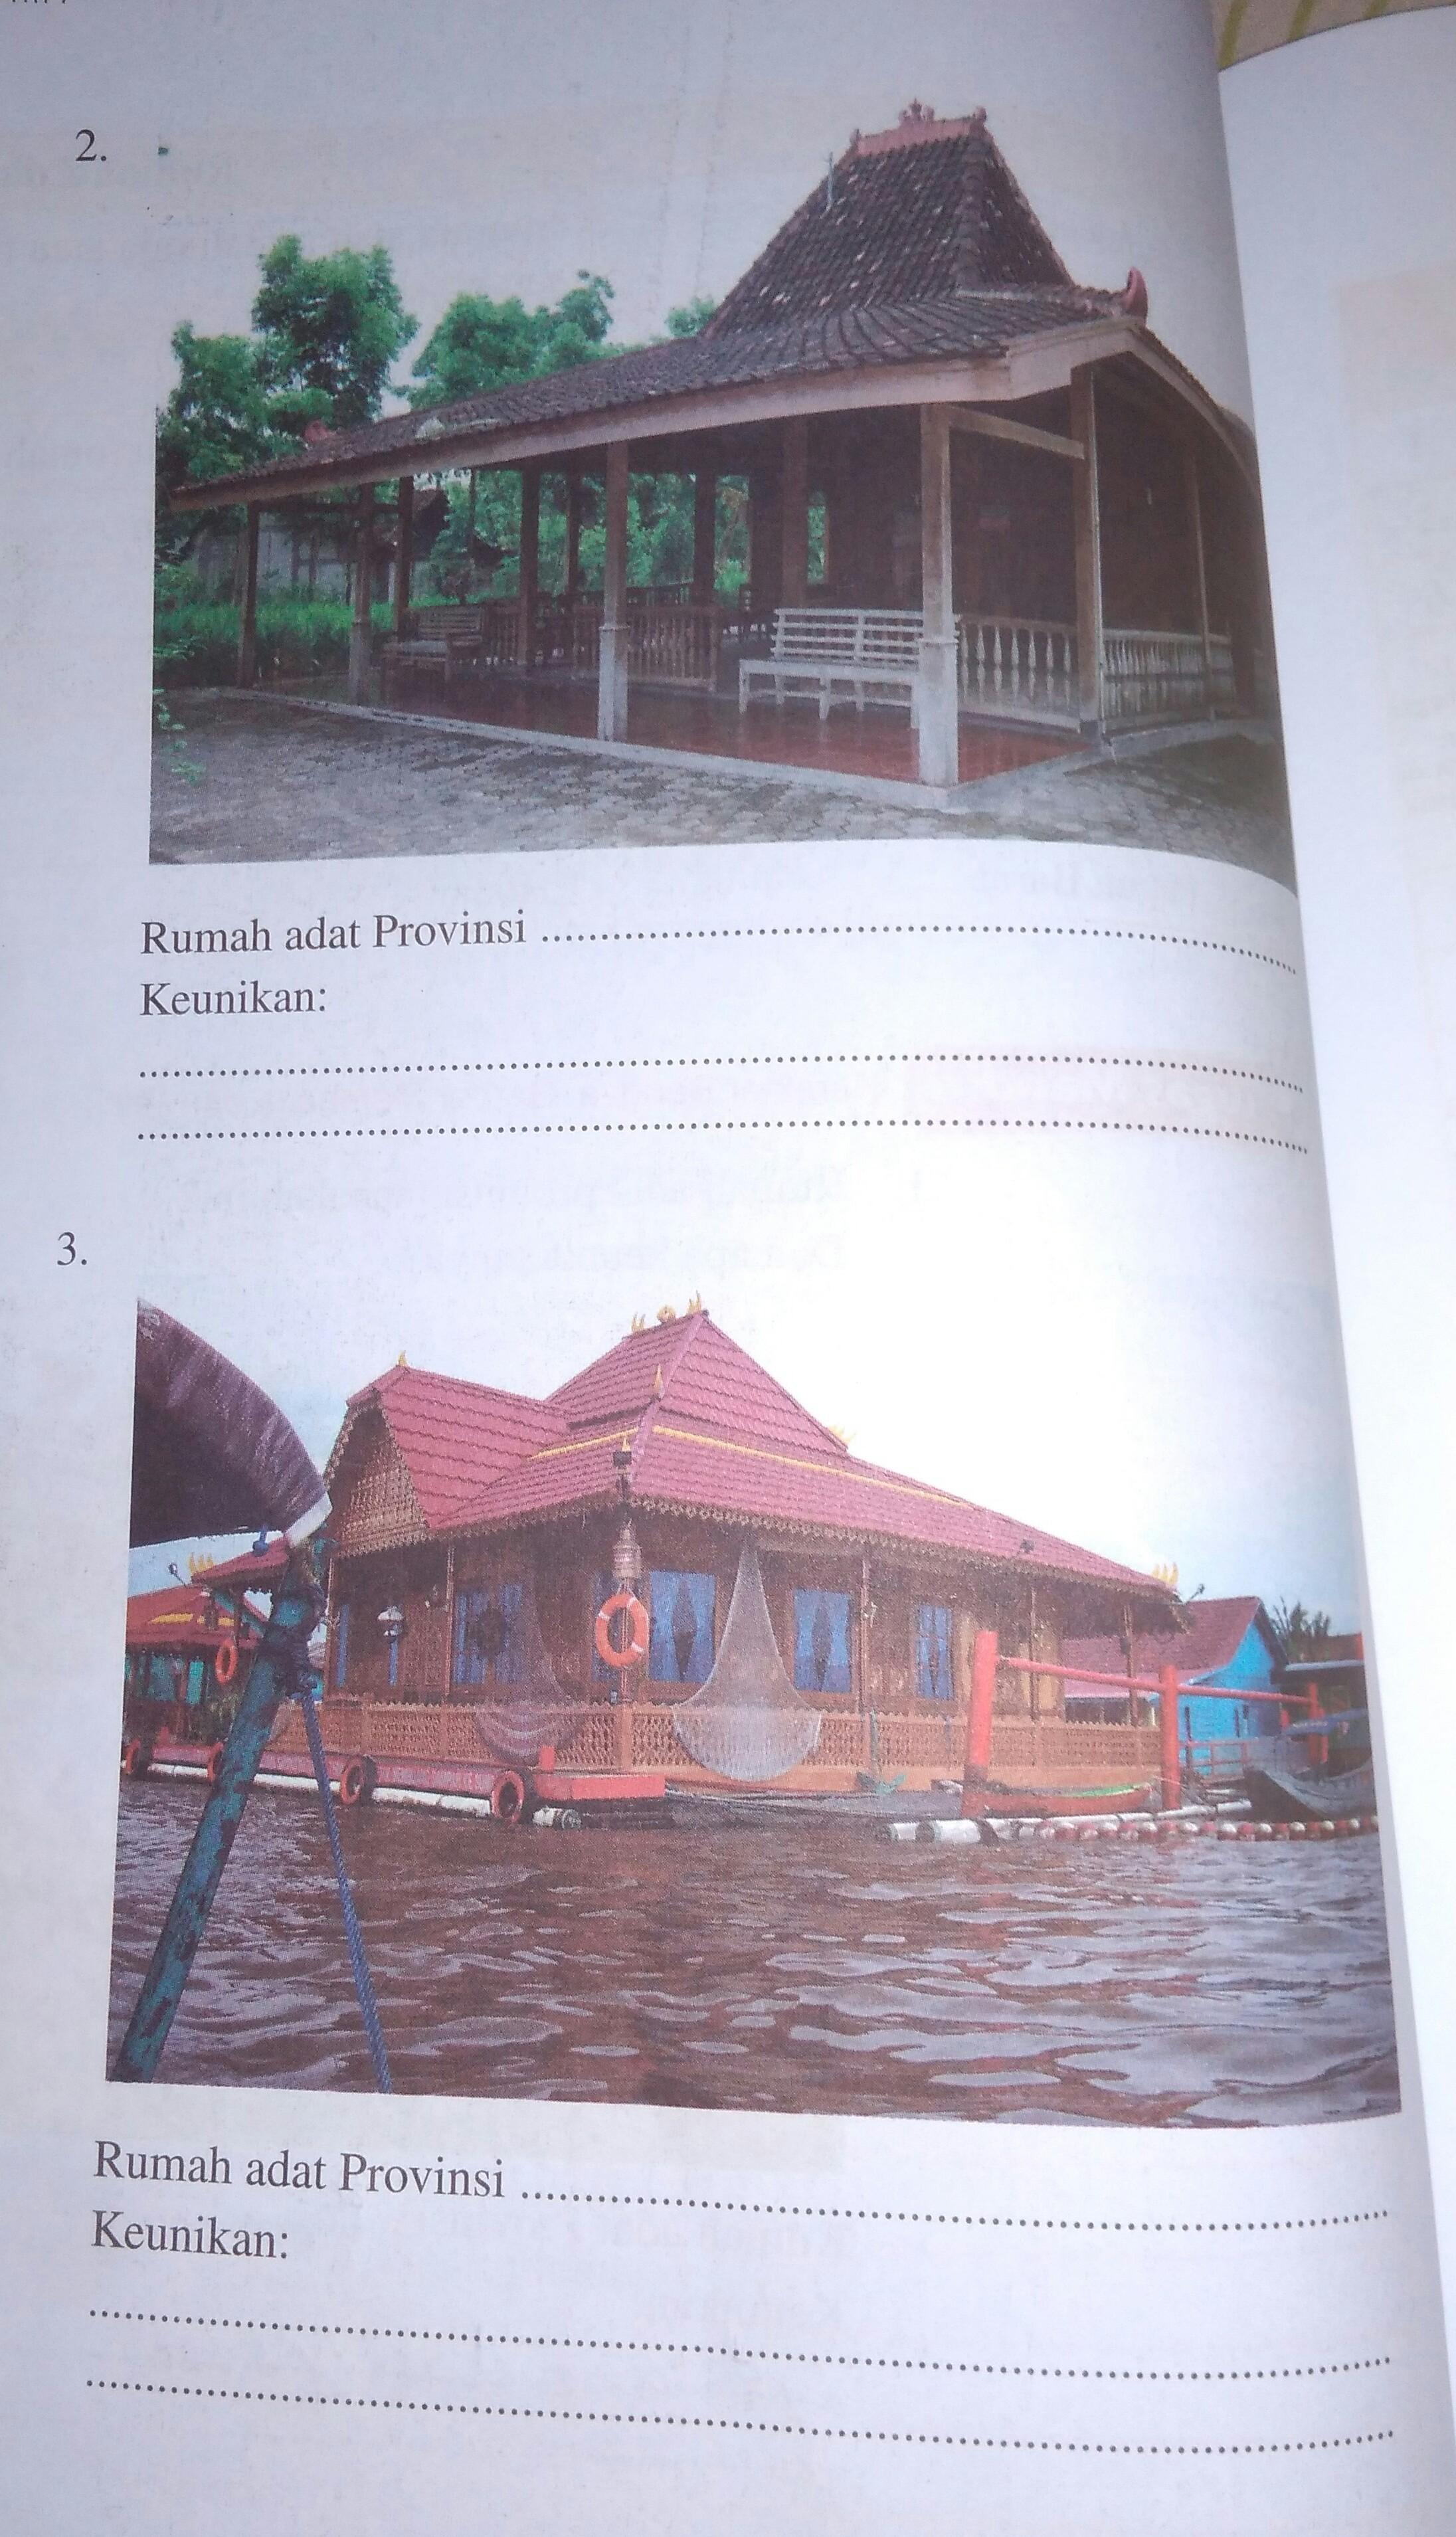 Rumah Joglo Berasal Dari Daerah Brainly Rumah Joglo Limasan Work